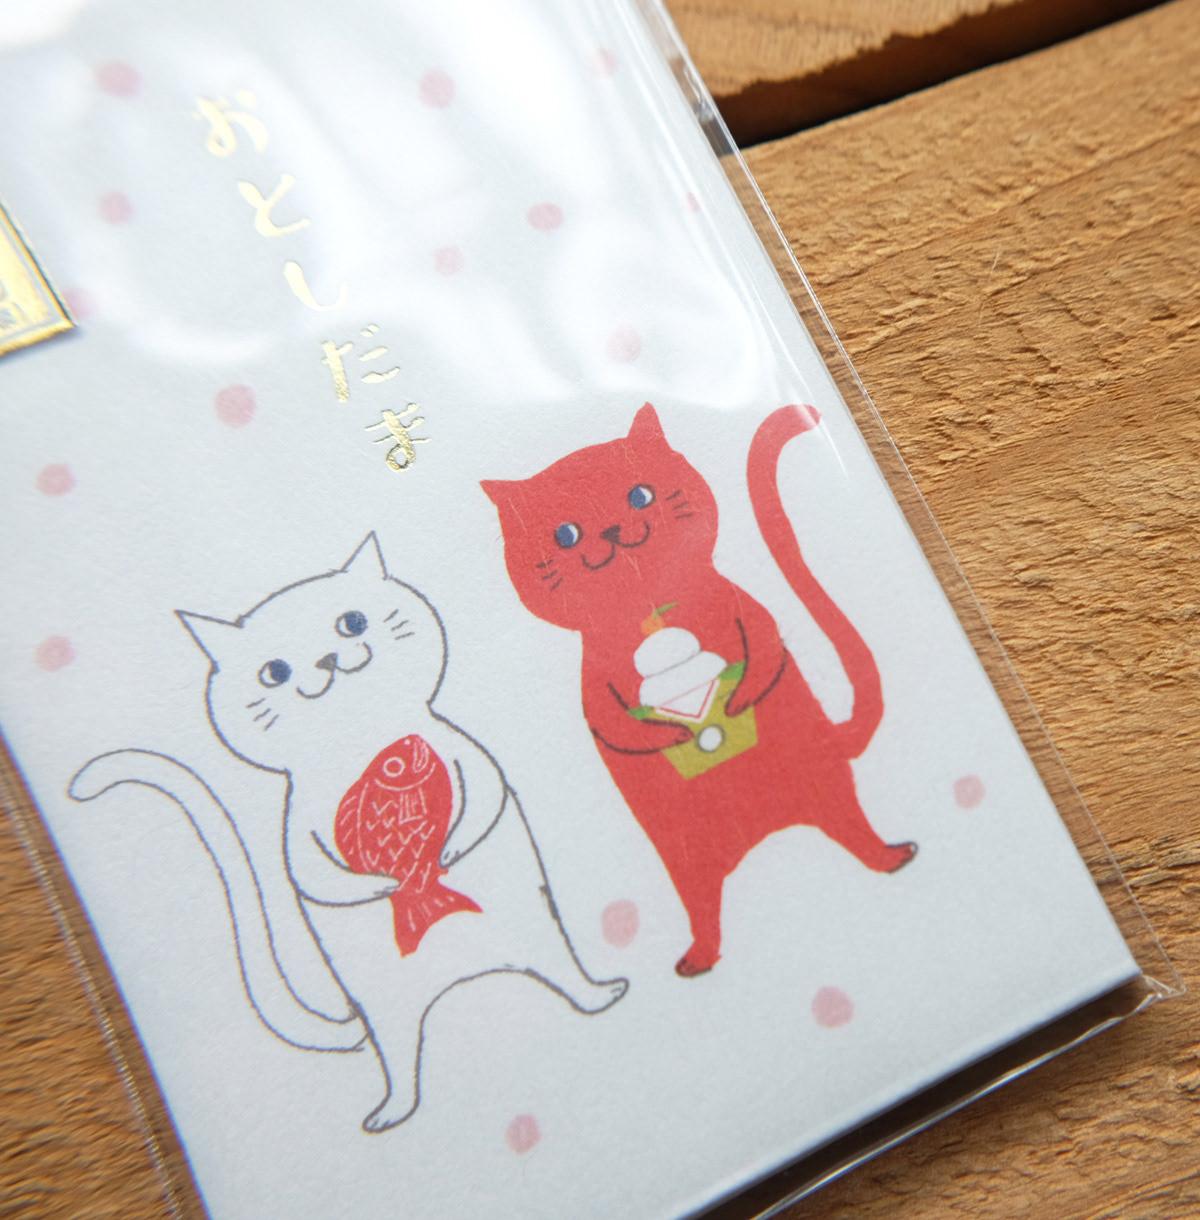 Image may contain: cat, cartoon and handmade